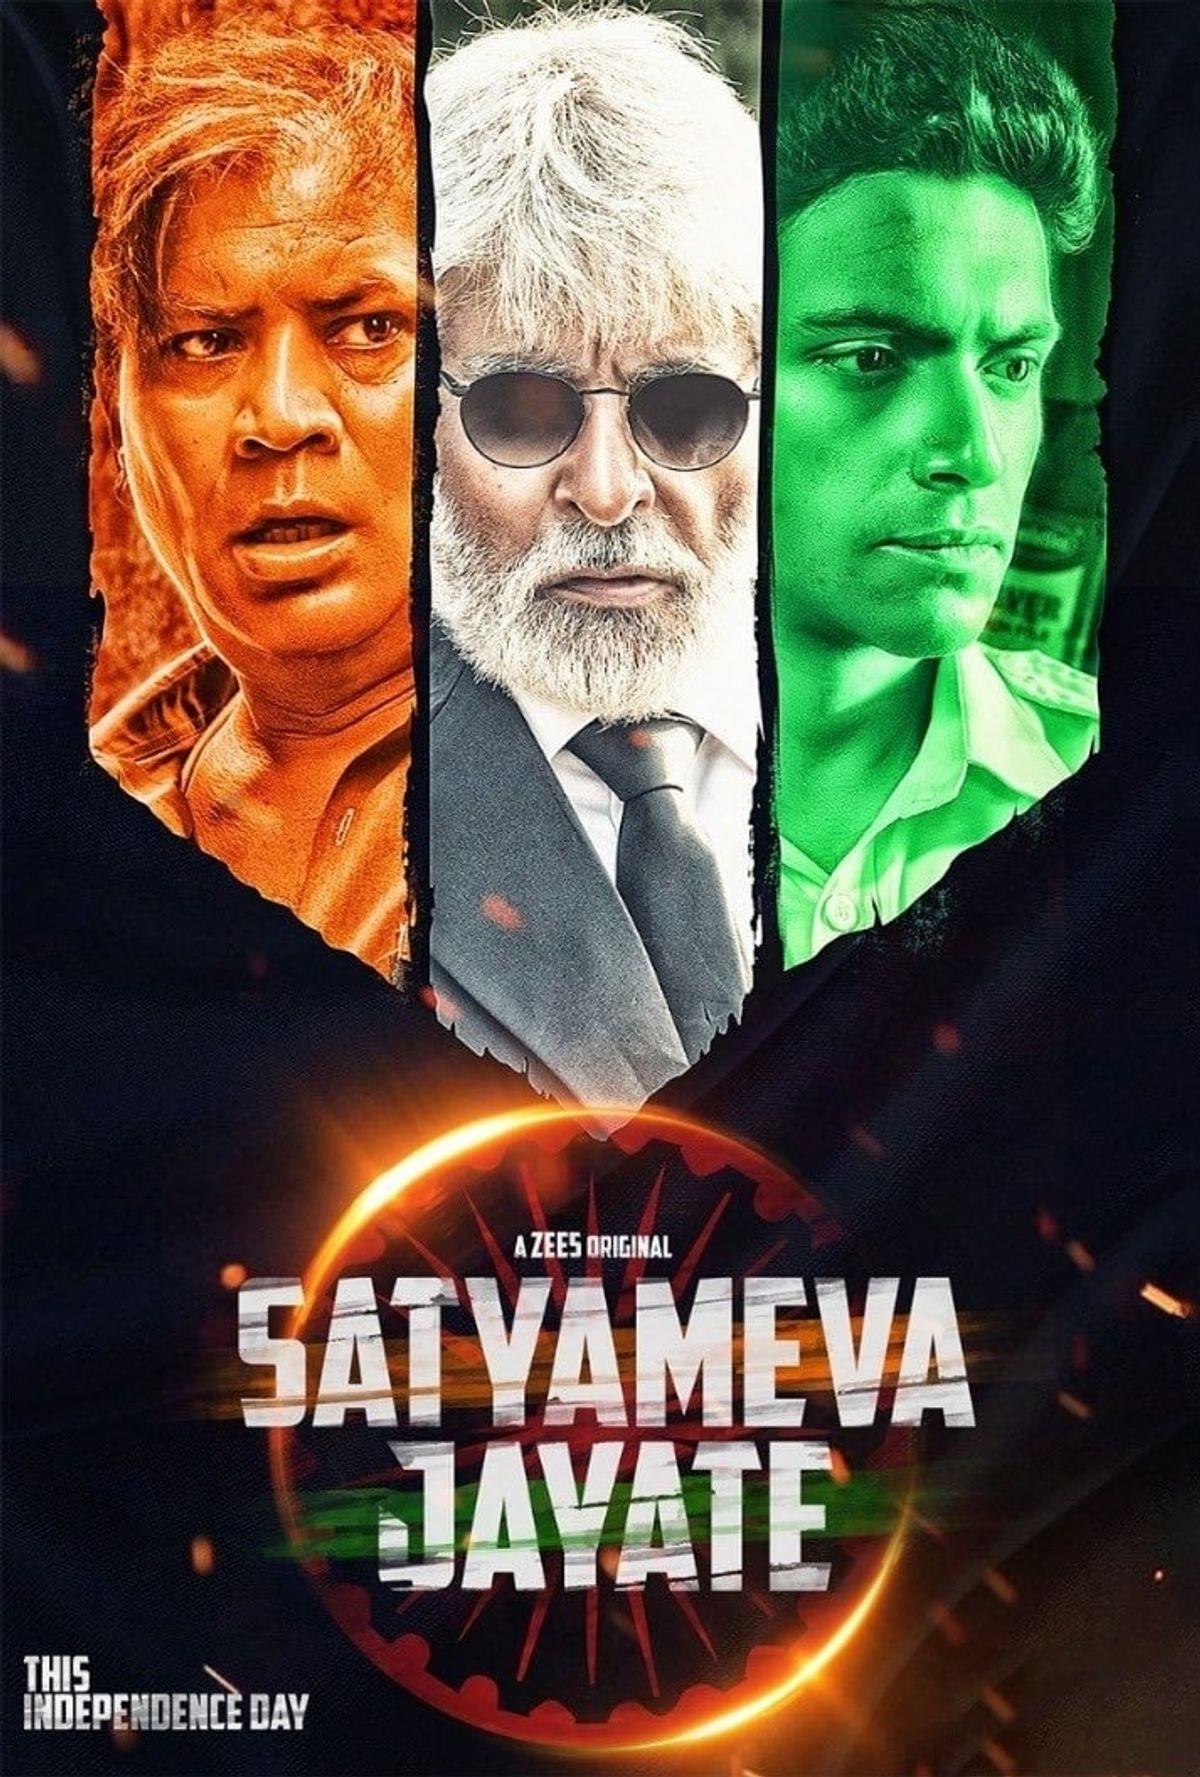 Sudiptaa Chakraborty Best Movies, TV Shows and Web Series List